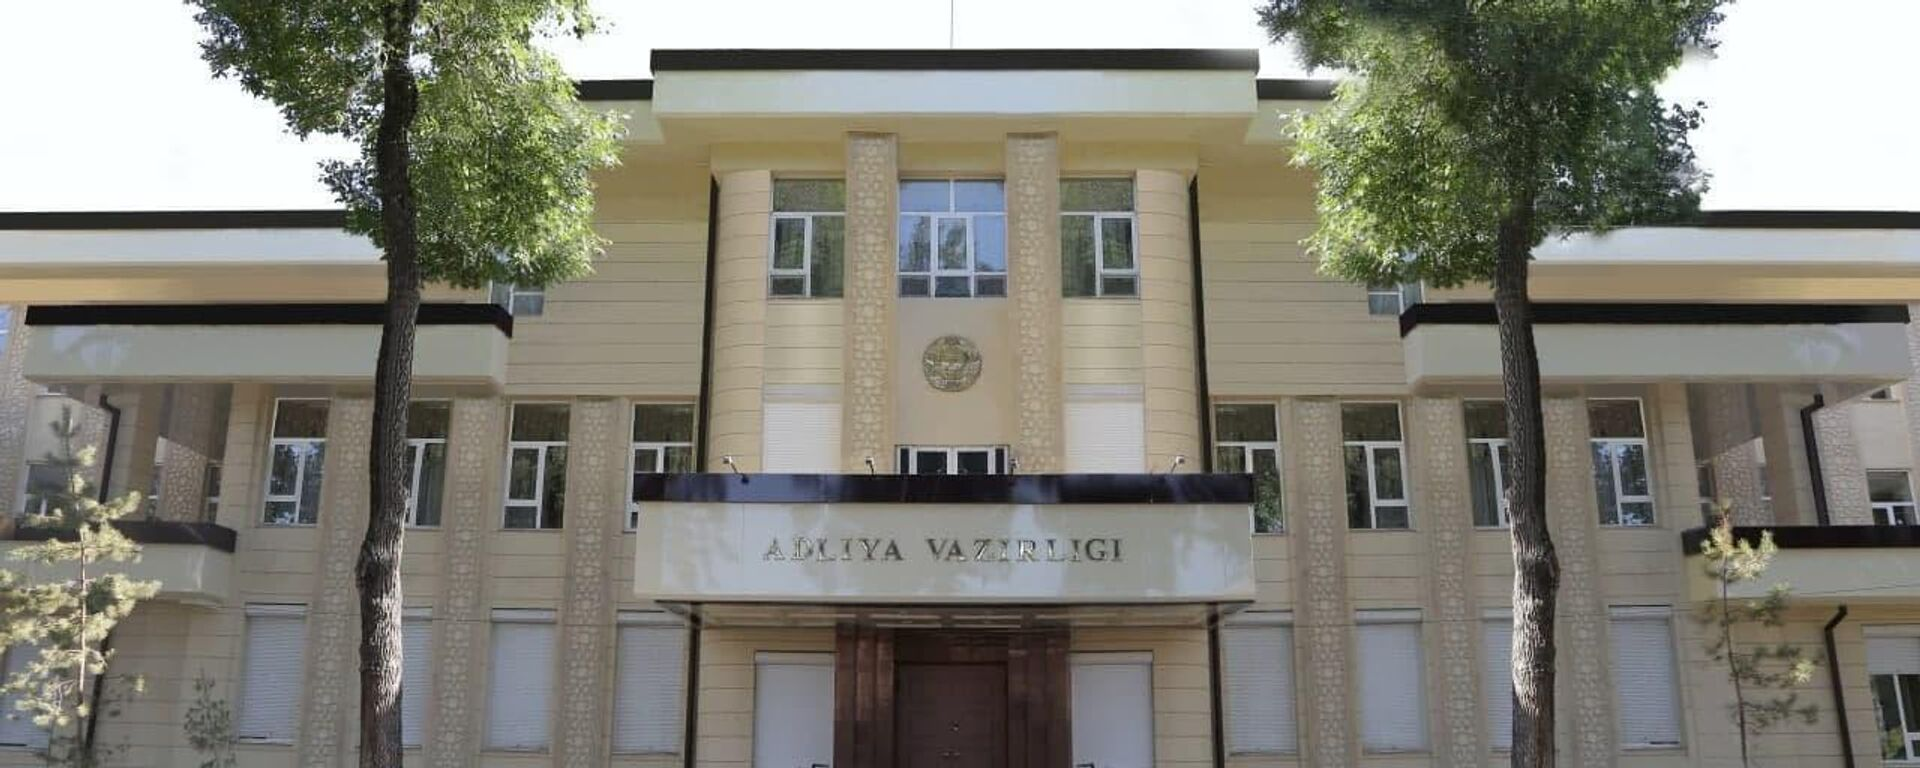 Здание Министерства Юстиции Узбекистана - новое  - Sputnik Узбекистан, 1920, 30.06.2021